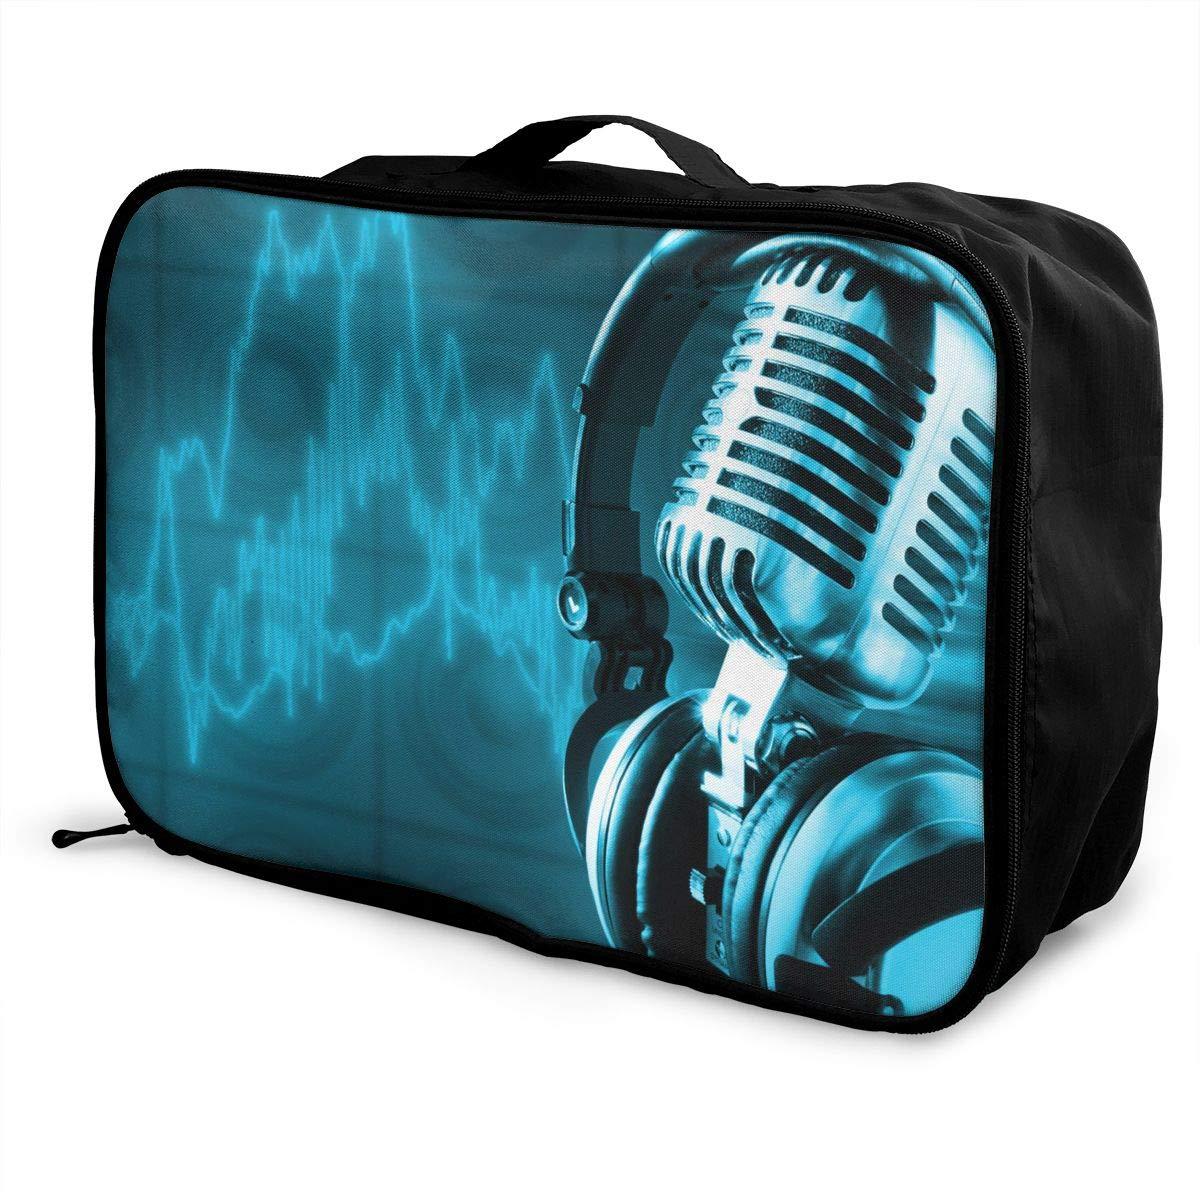 Travel Luggage Duffle Bag Lightweight Portable Handbag Microphone Pattern Large Capacity Waterproof Foldable Storage Tote